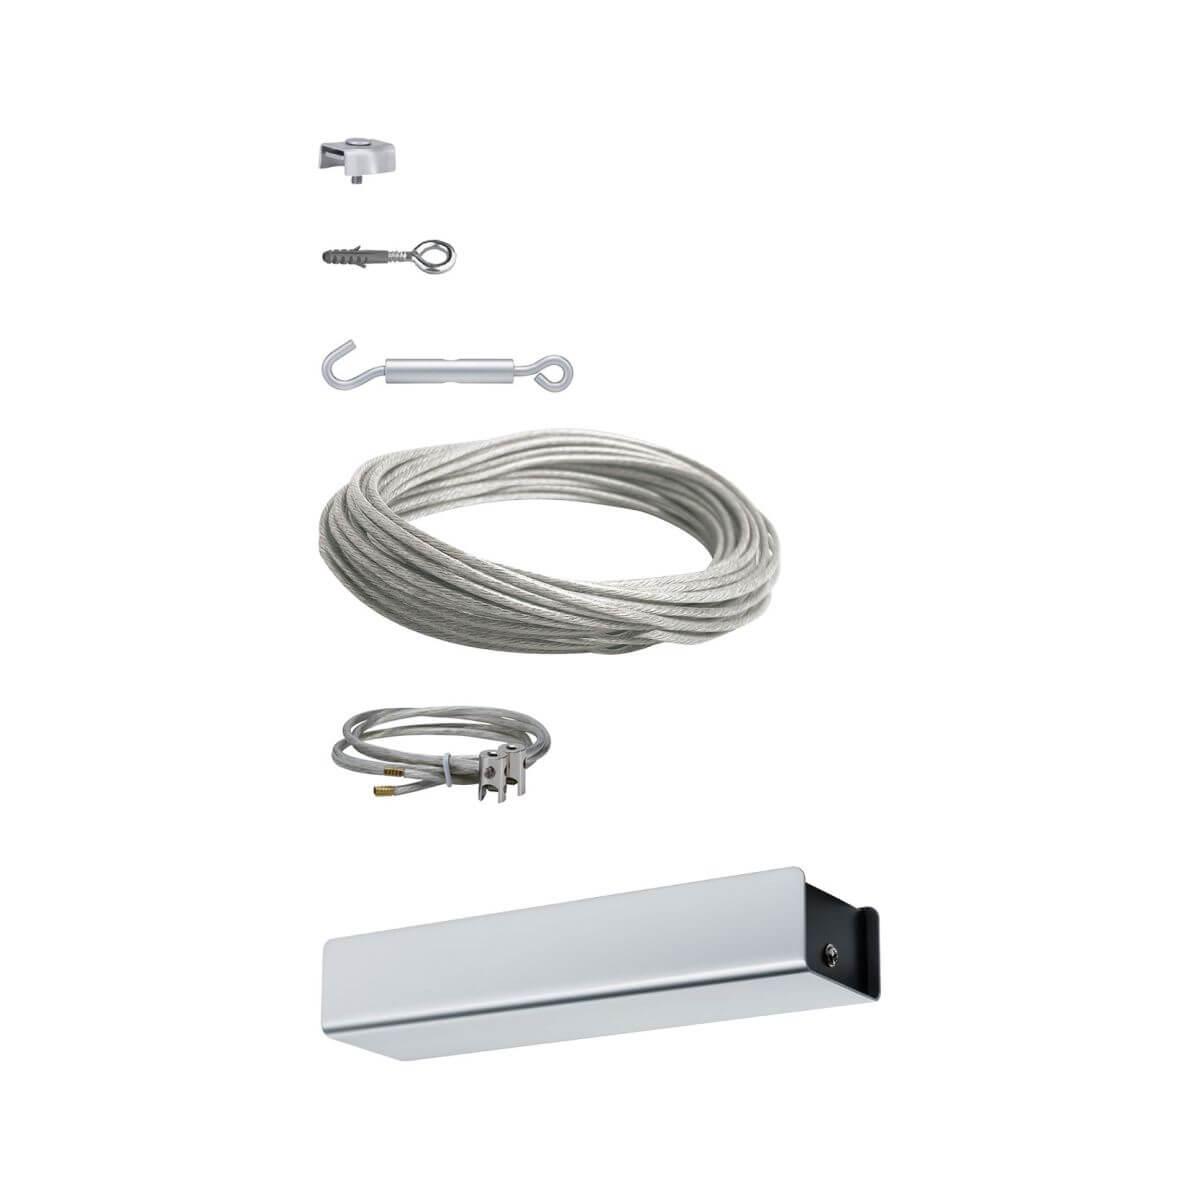 Paulmann Seil-Basissystem, Trafo 36W, 15m, Spann-Zubehör, 230V | 12VDC, Chrom matt